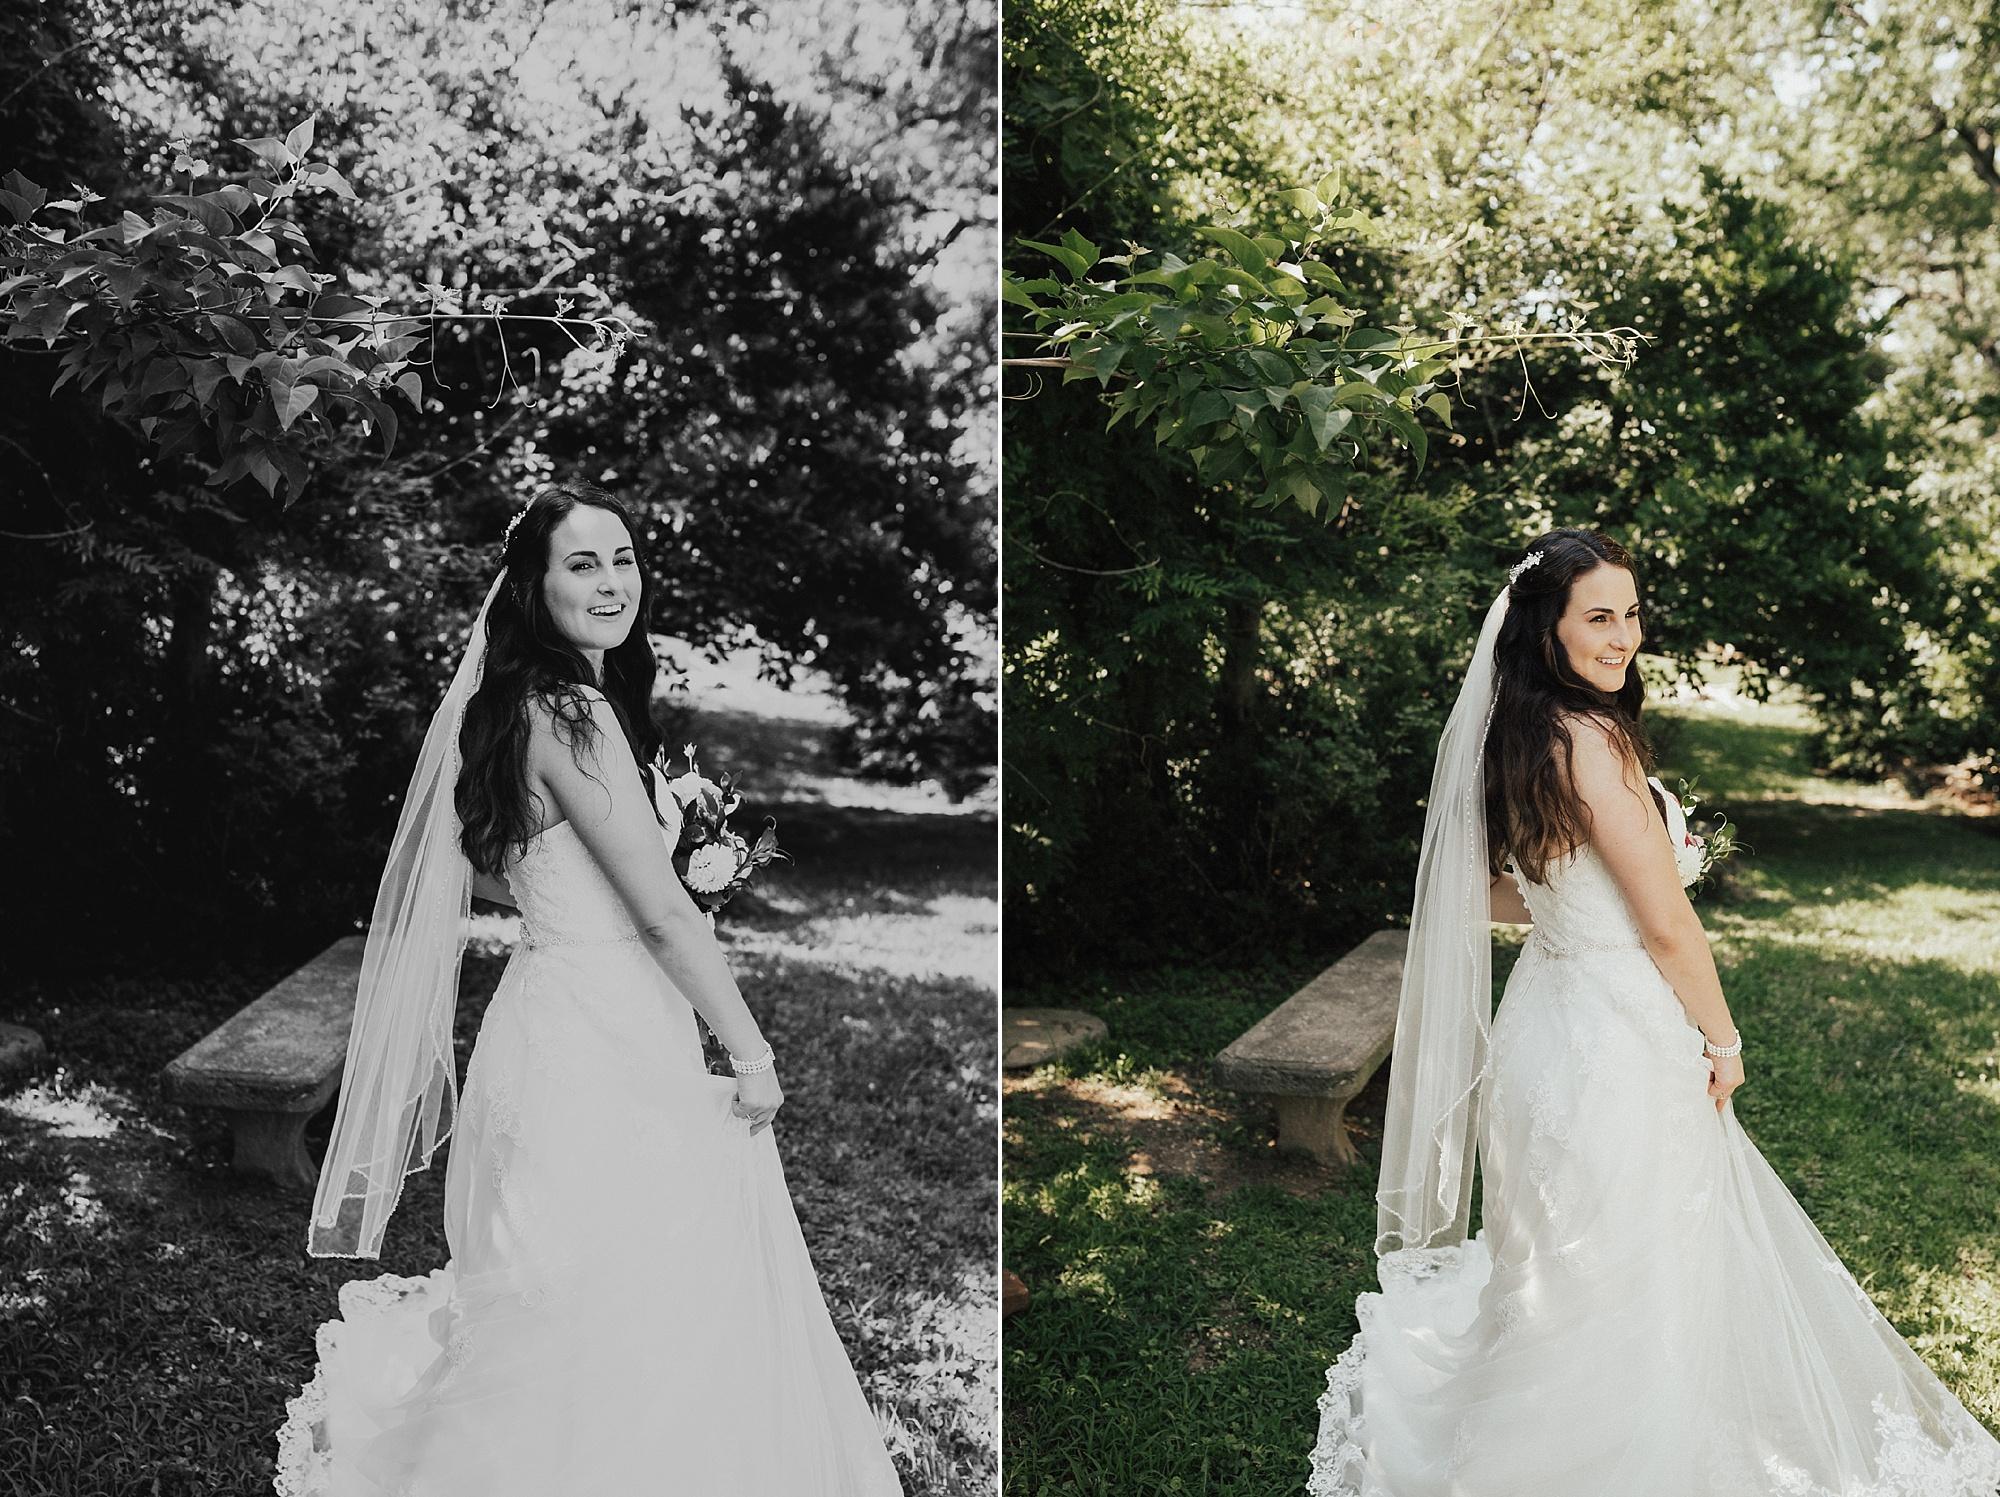 Love_by_Joe_Mac_Nicole_Patrick_Gables_At_Chadds_Ford_Wedding_Photography_Best_Philadelphia__0046.jpg